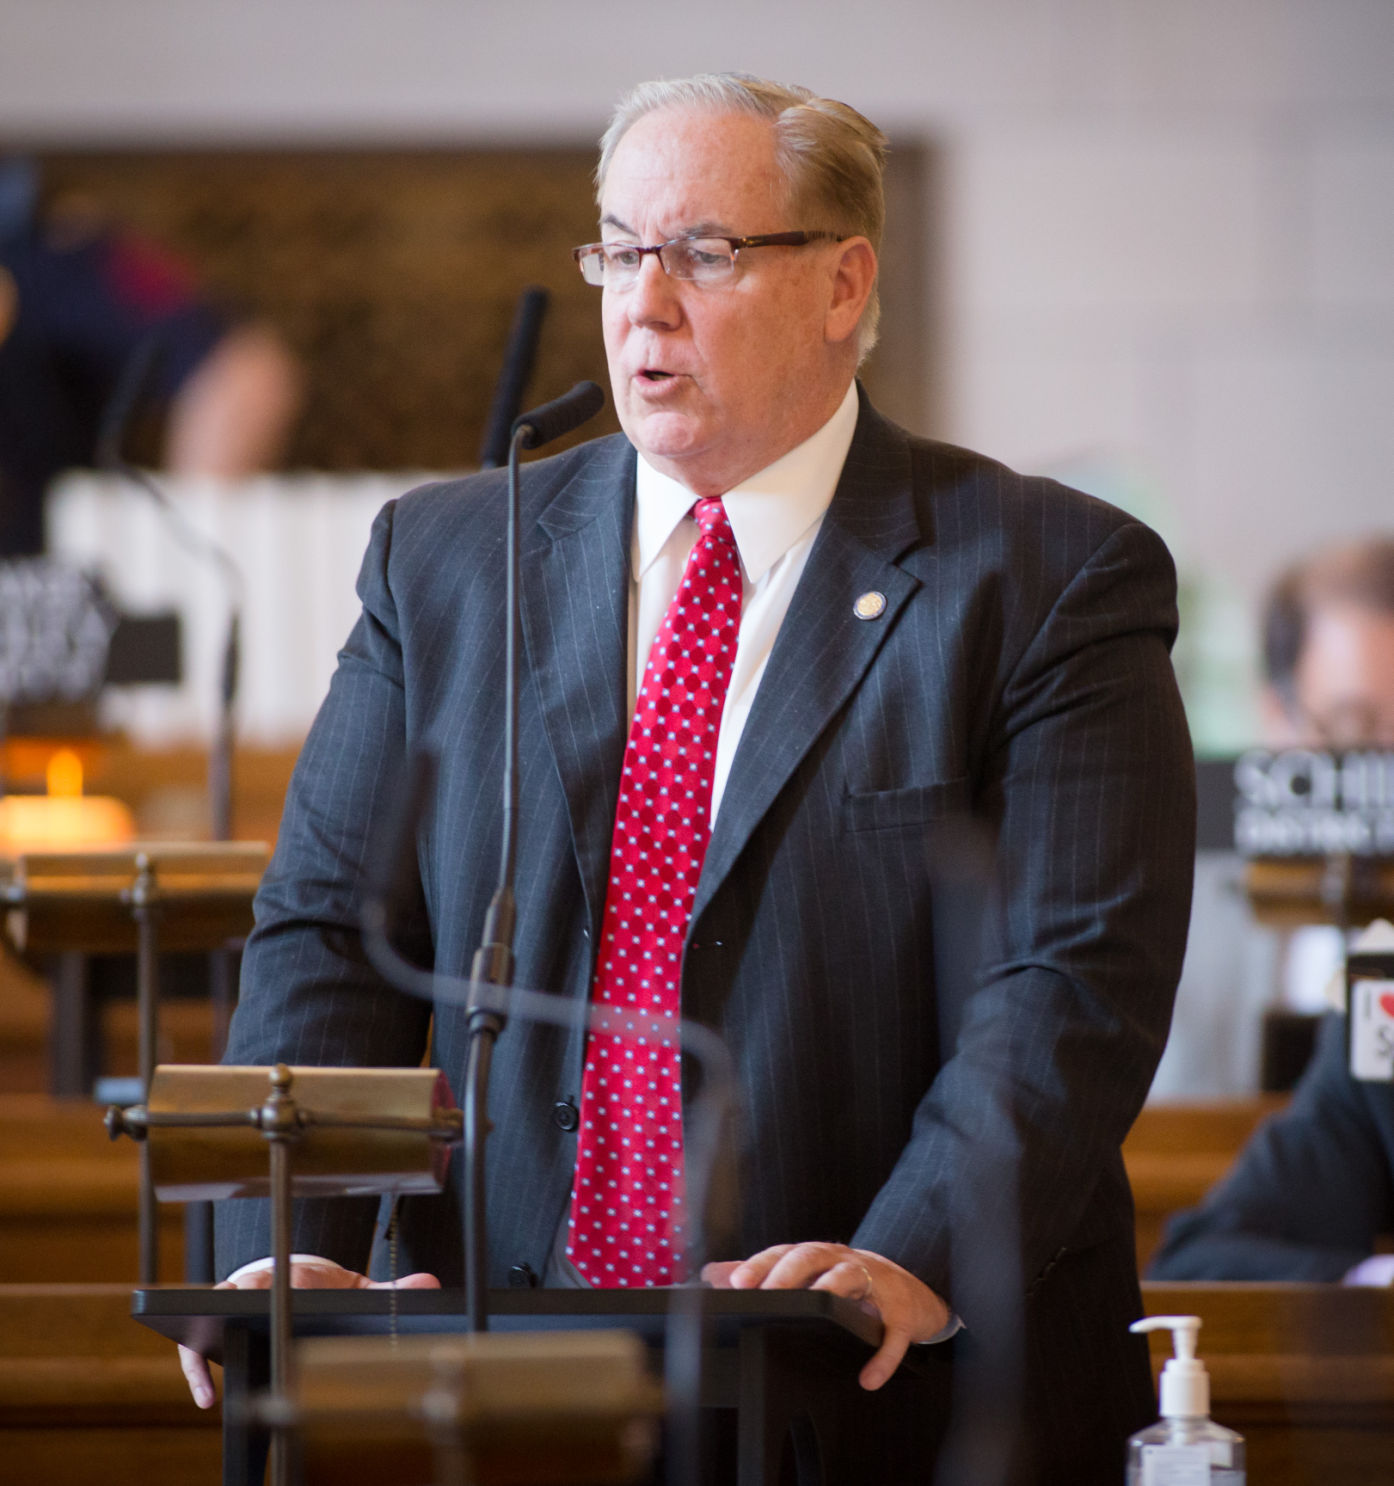 Panel tells embattled Nebraska senator to resign by Friday